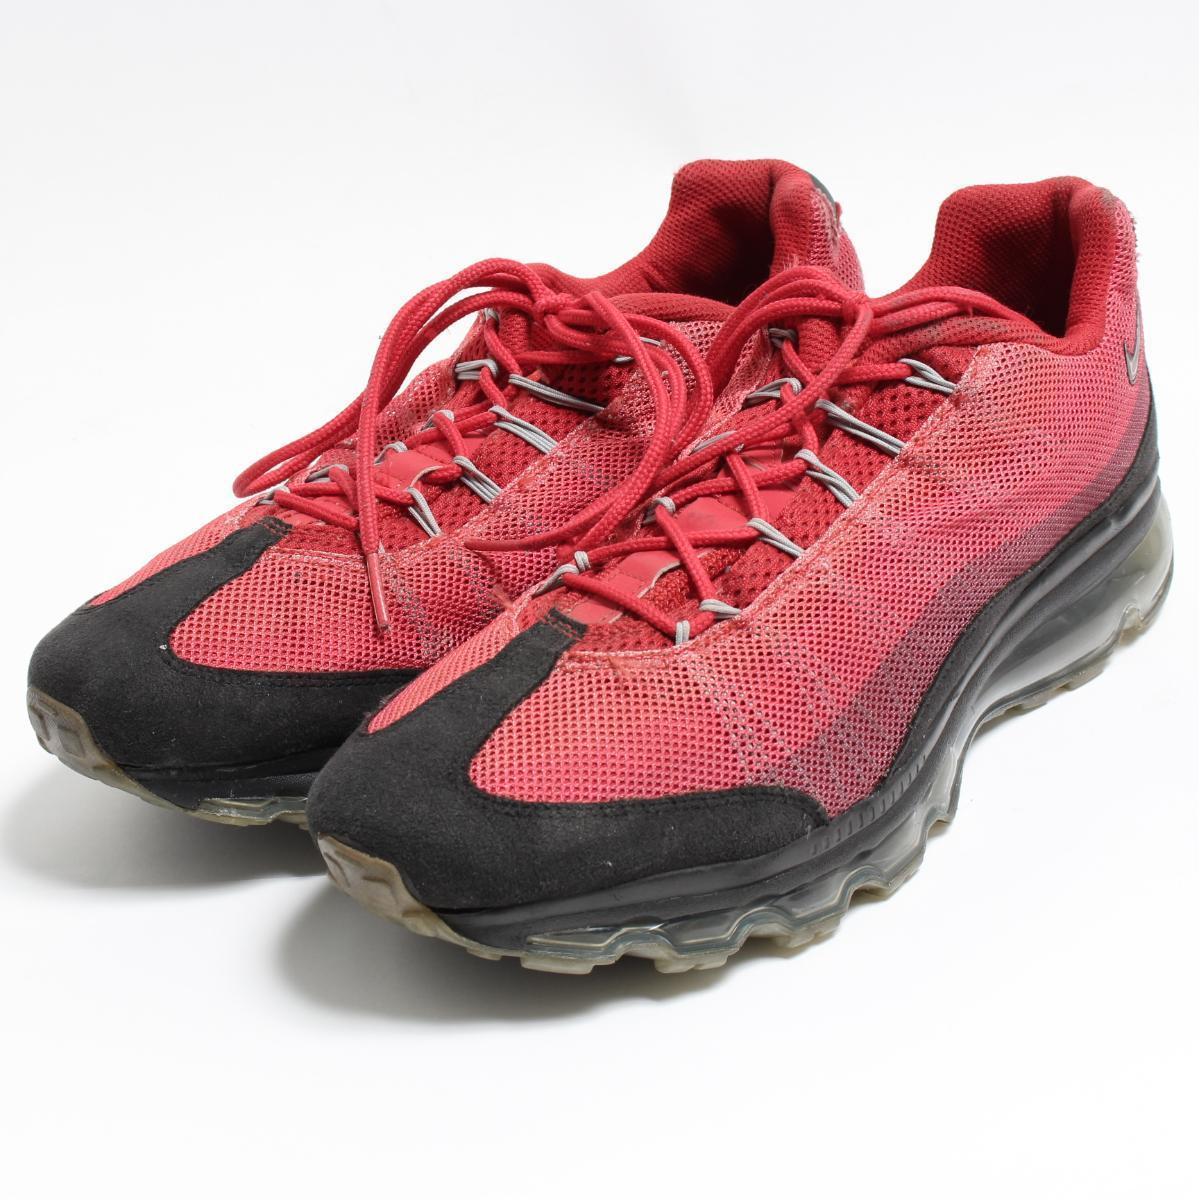 newest collection 4d00e 12b6b Nike NIKE AIR MAX 95 DYN FW sneakers US10 .5 men s 28.5cm  bon4295 ...